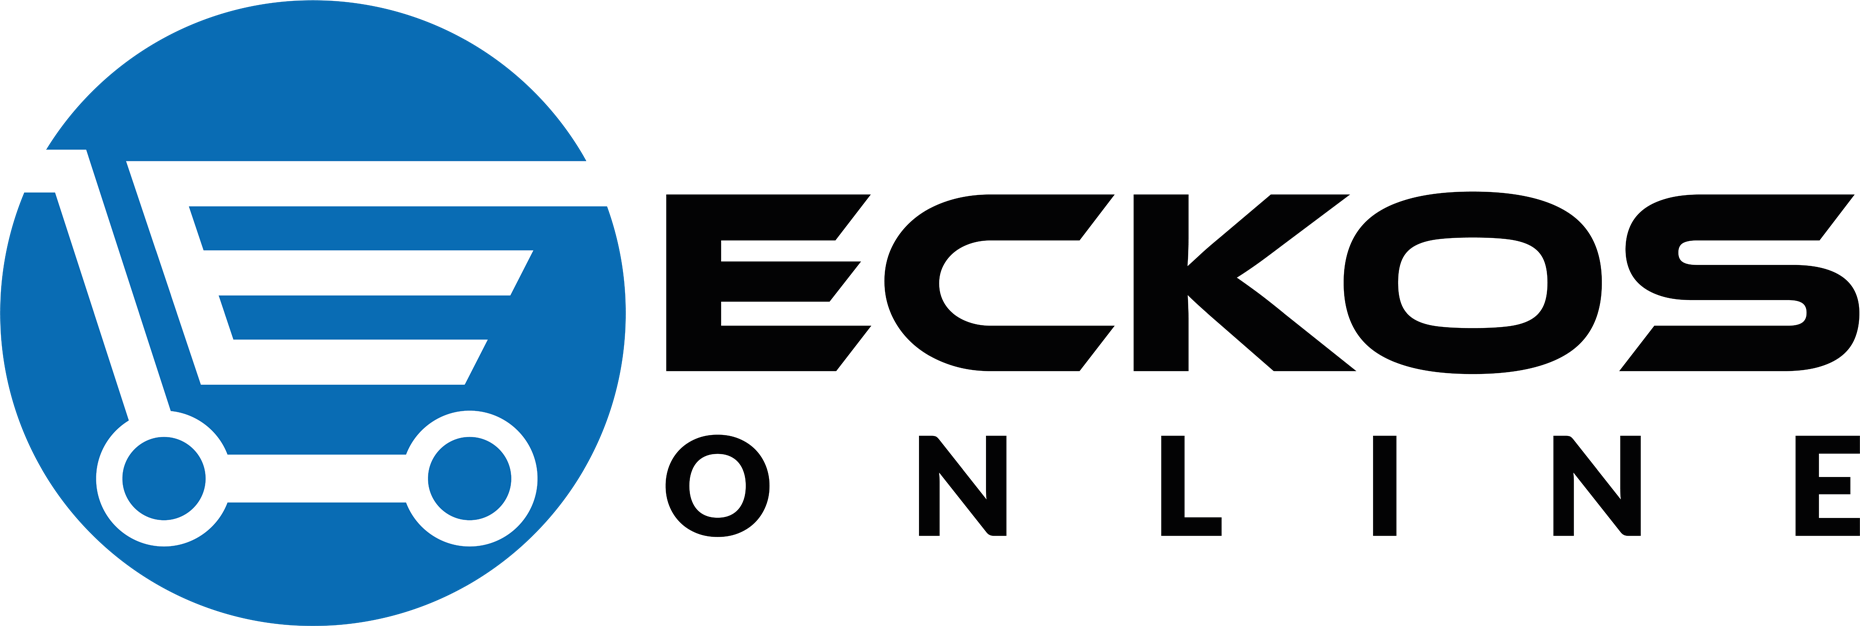 Eckos Online